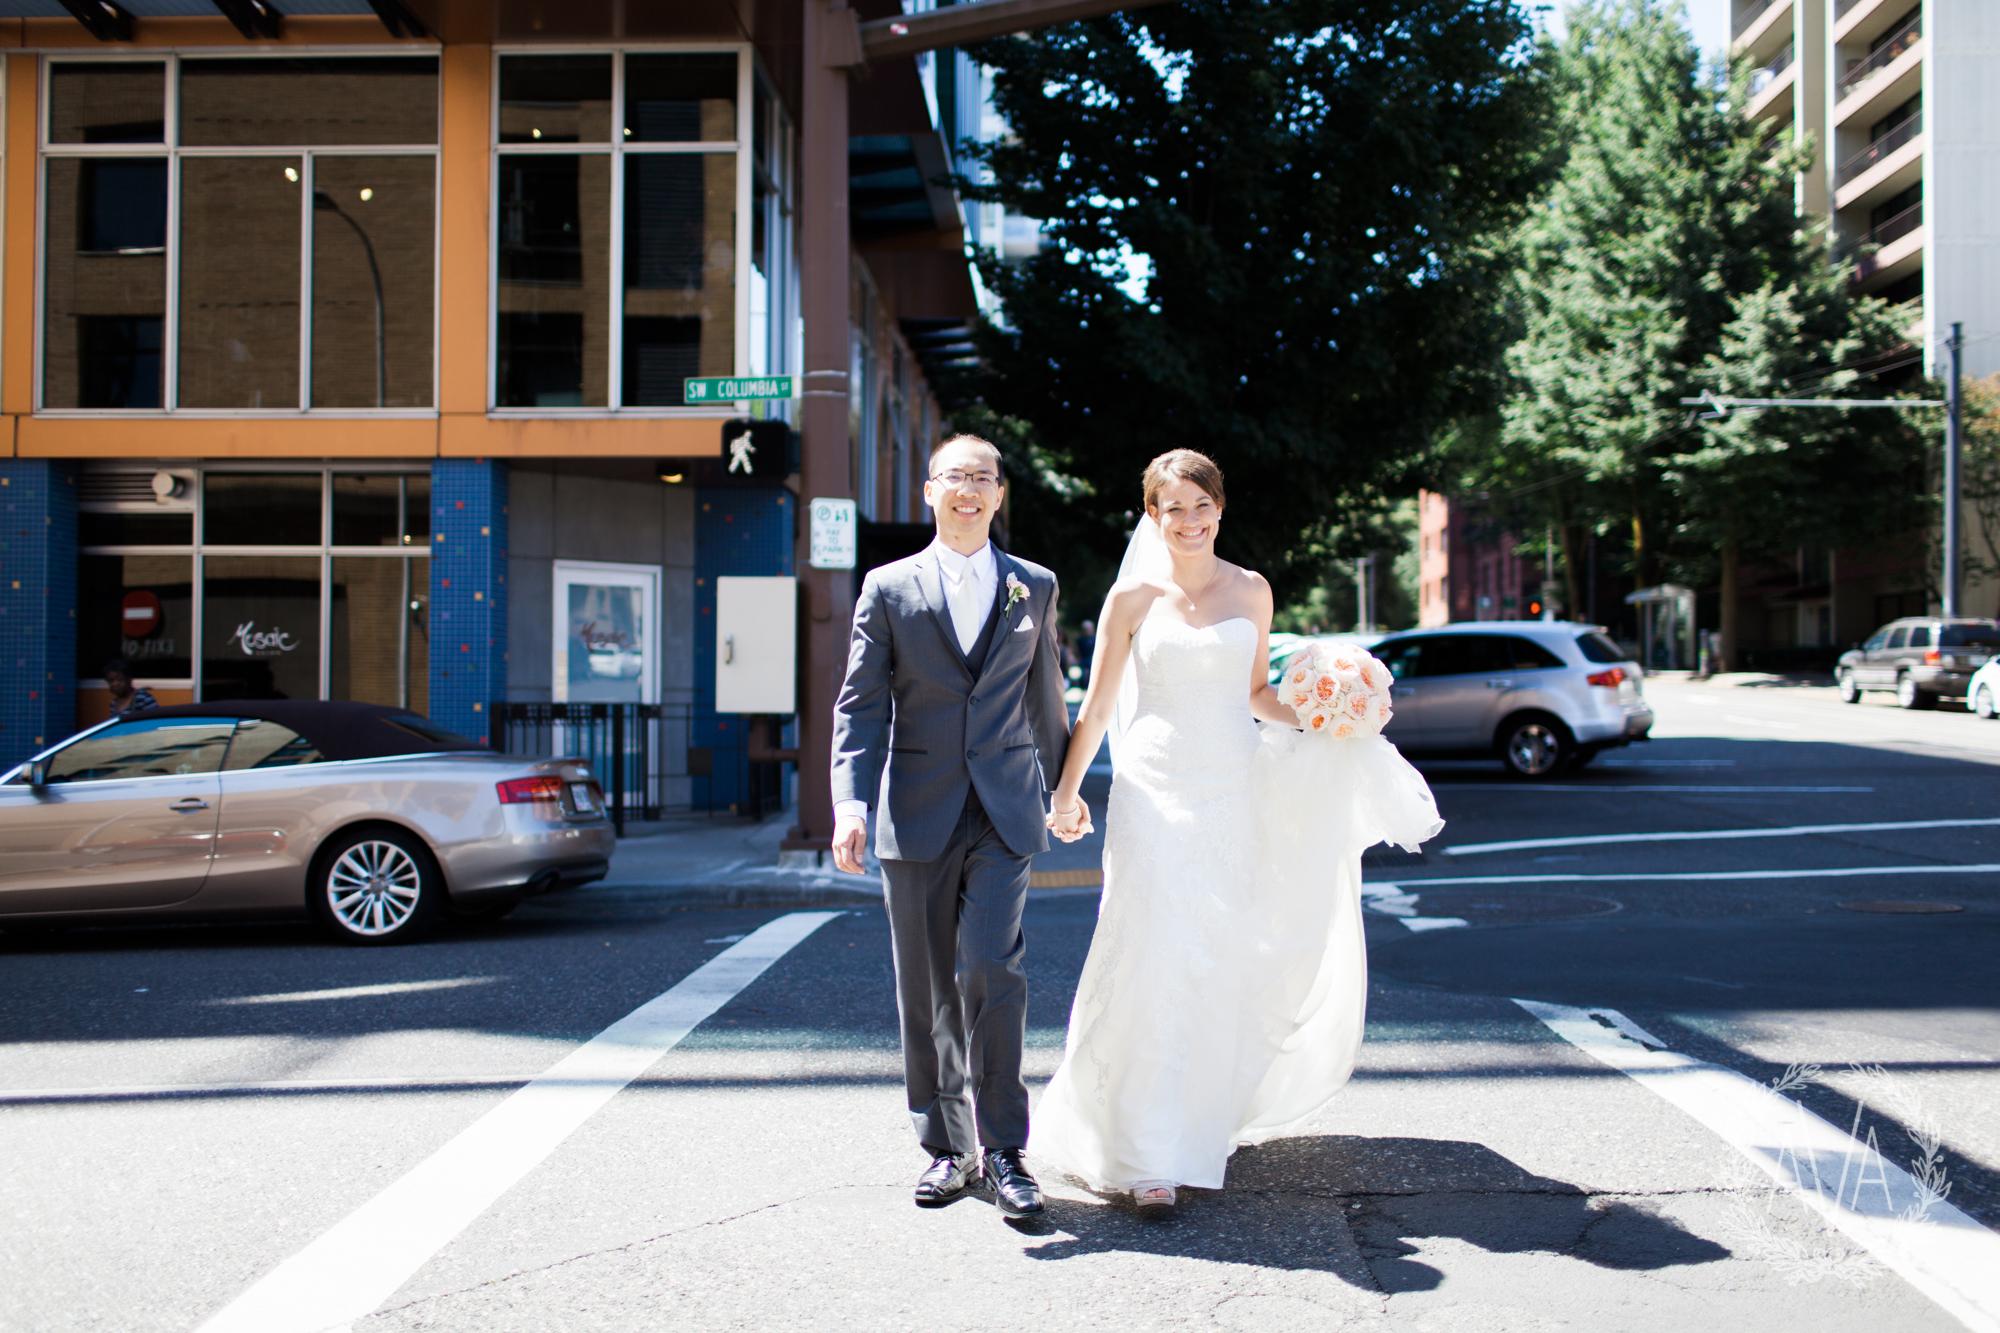 ava_chiew_wedding-15.jpg